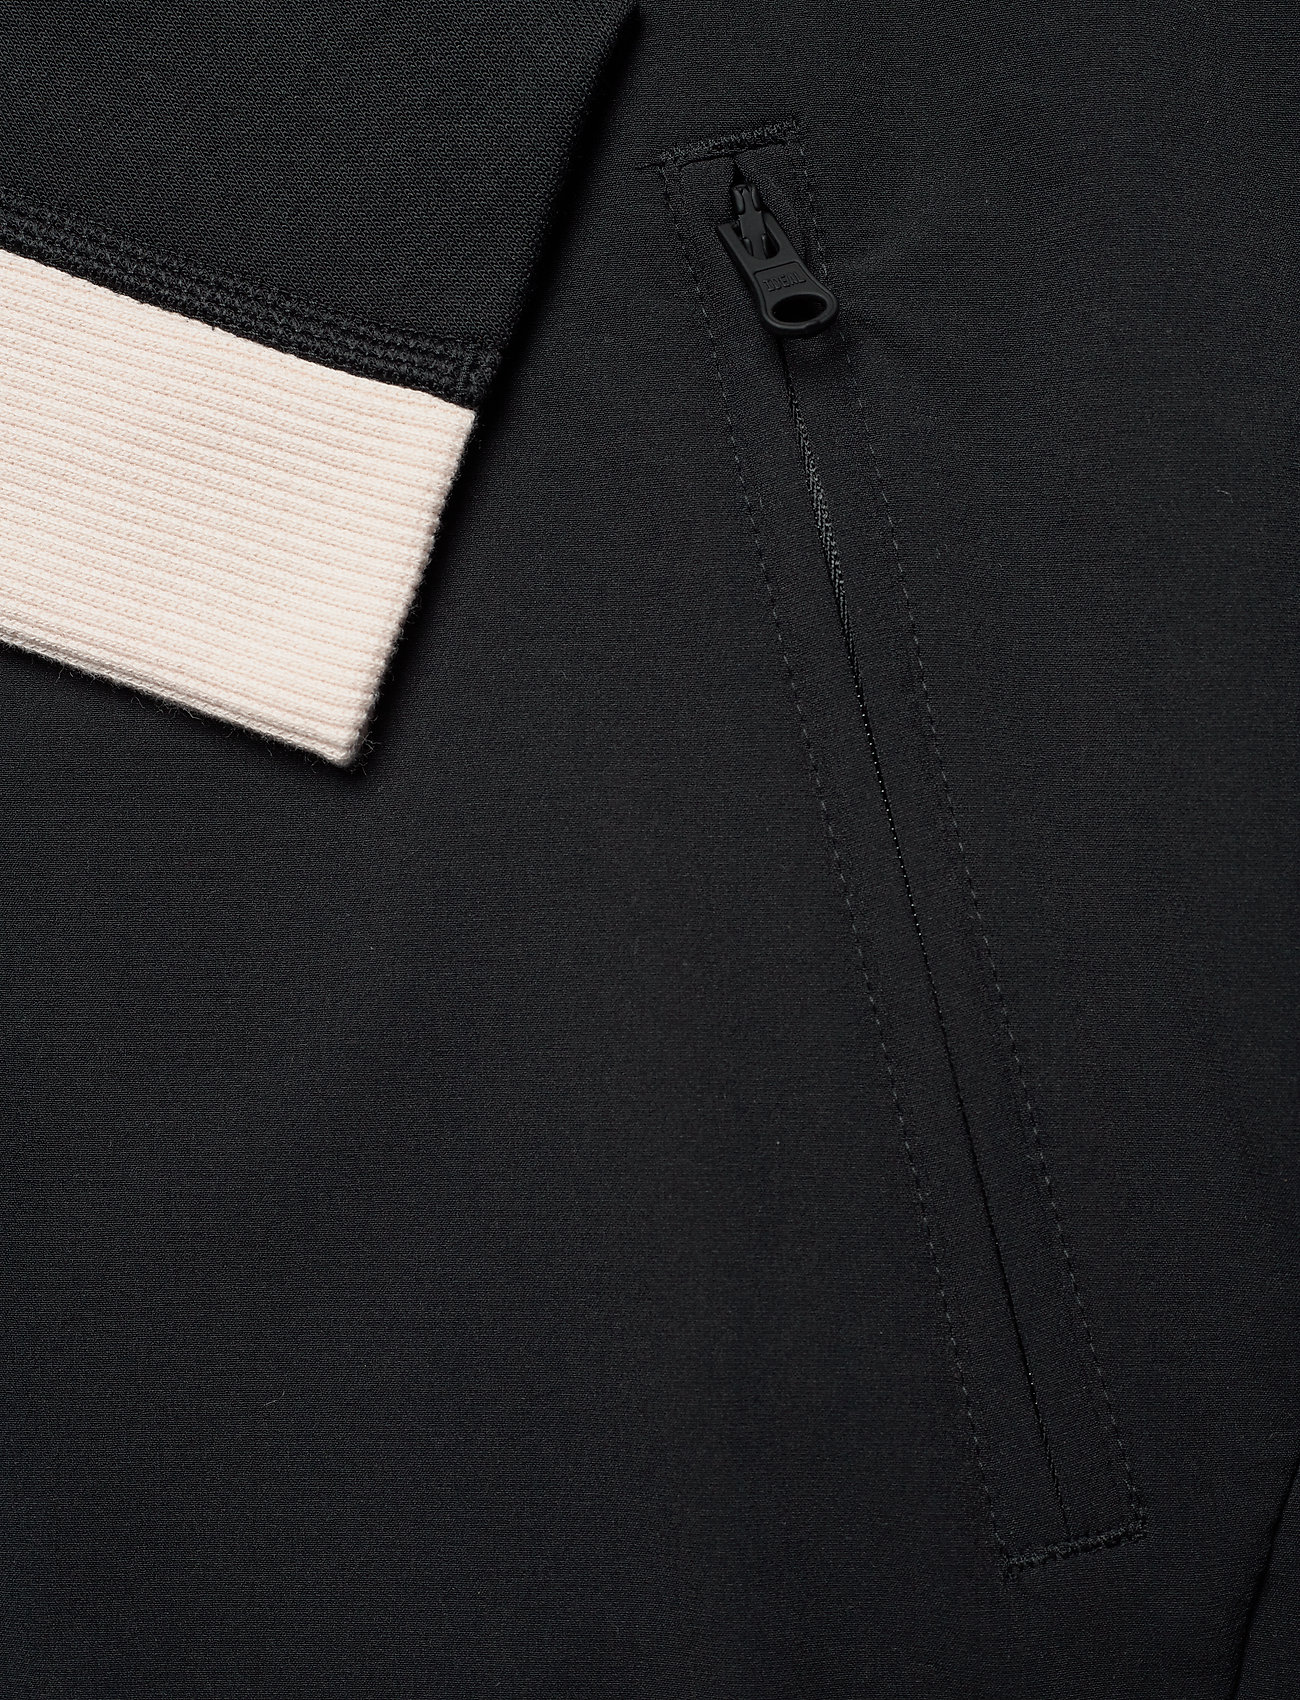 Adidas Performance W Vrct Jk - Sweatshirts Black/linen